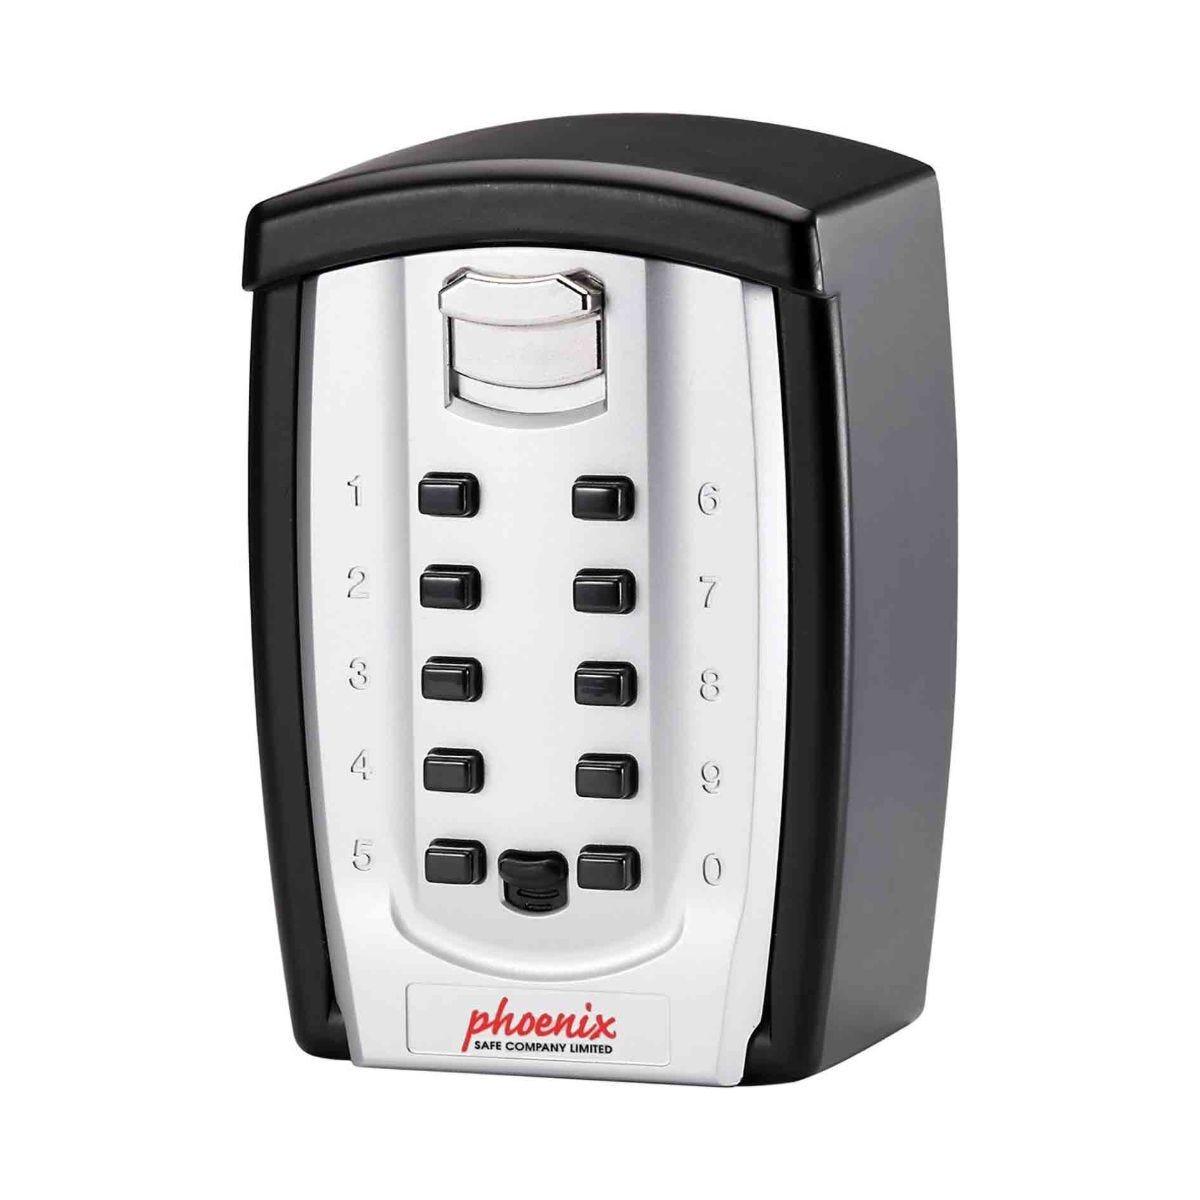 Phoenix Key Store KS0003C Key Safe with Combination Lock & Weatherproof Cover Size 3